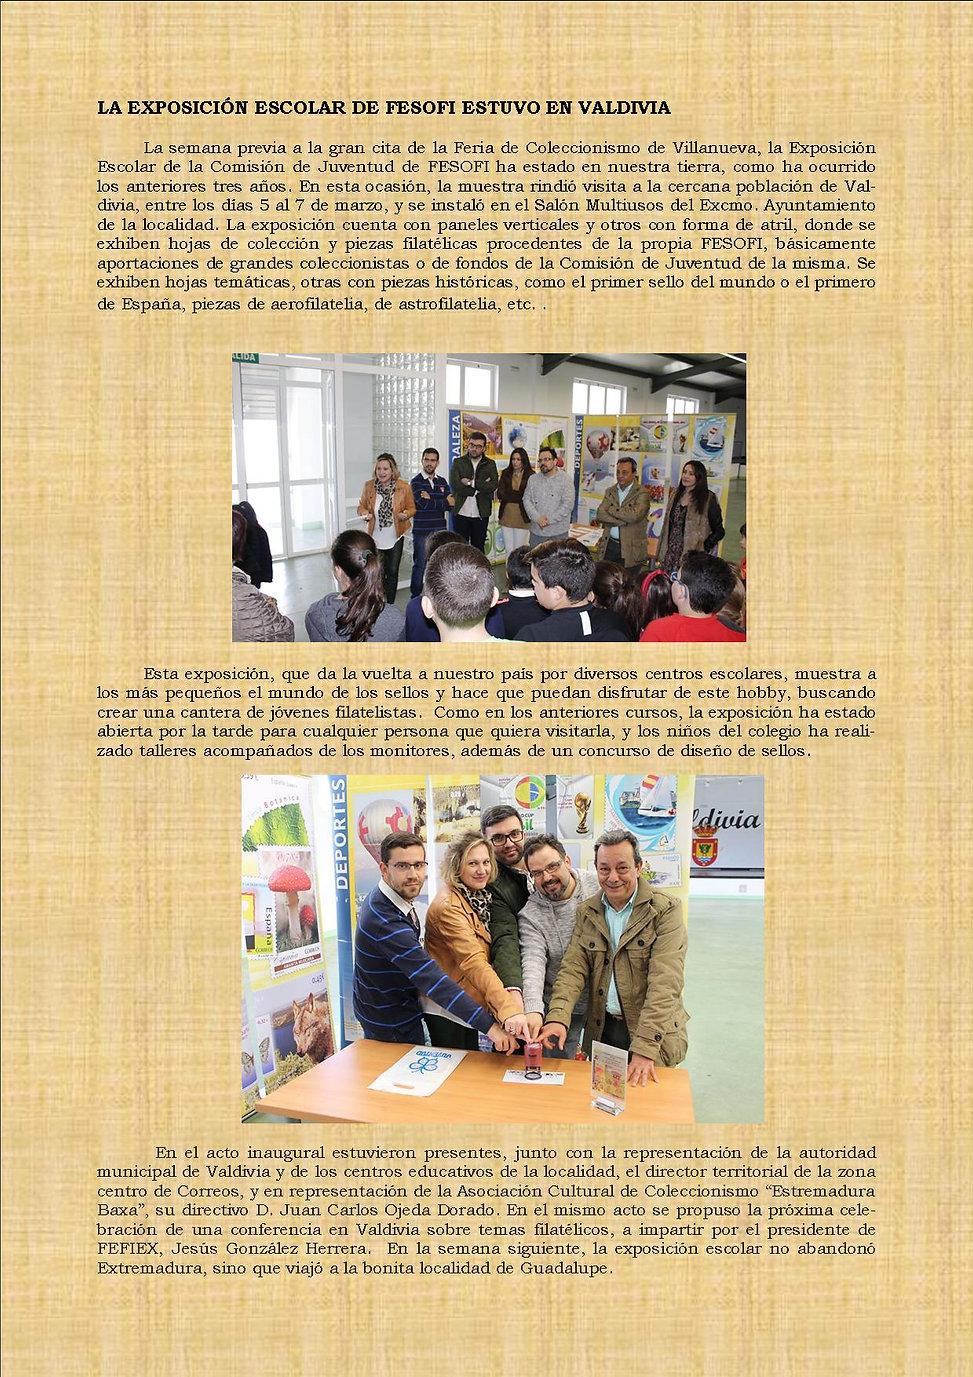 Noticia_exposición_escolar_en_Valdivia_